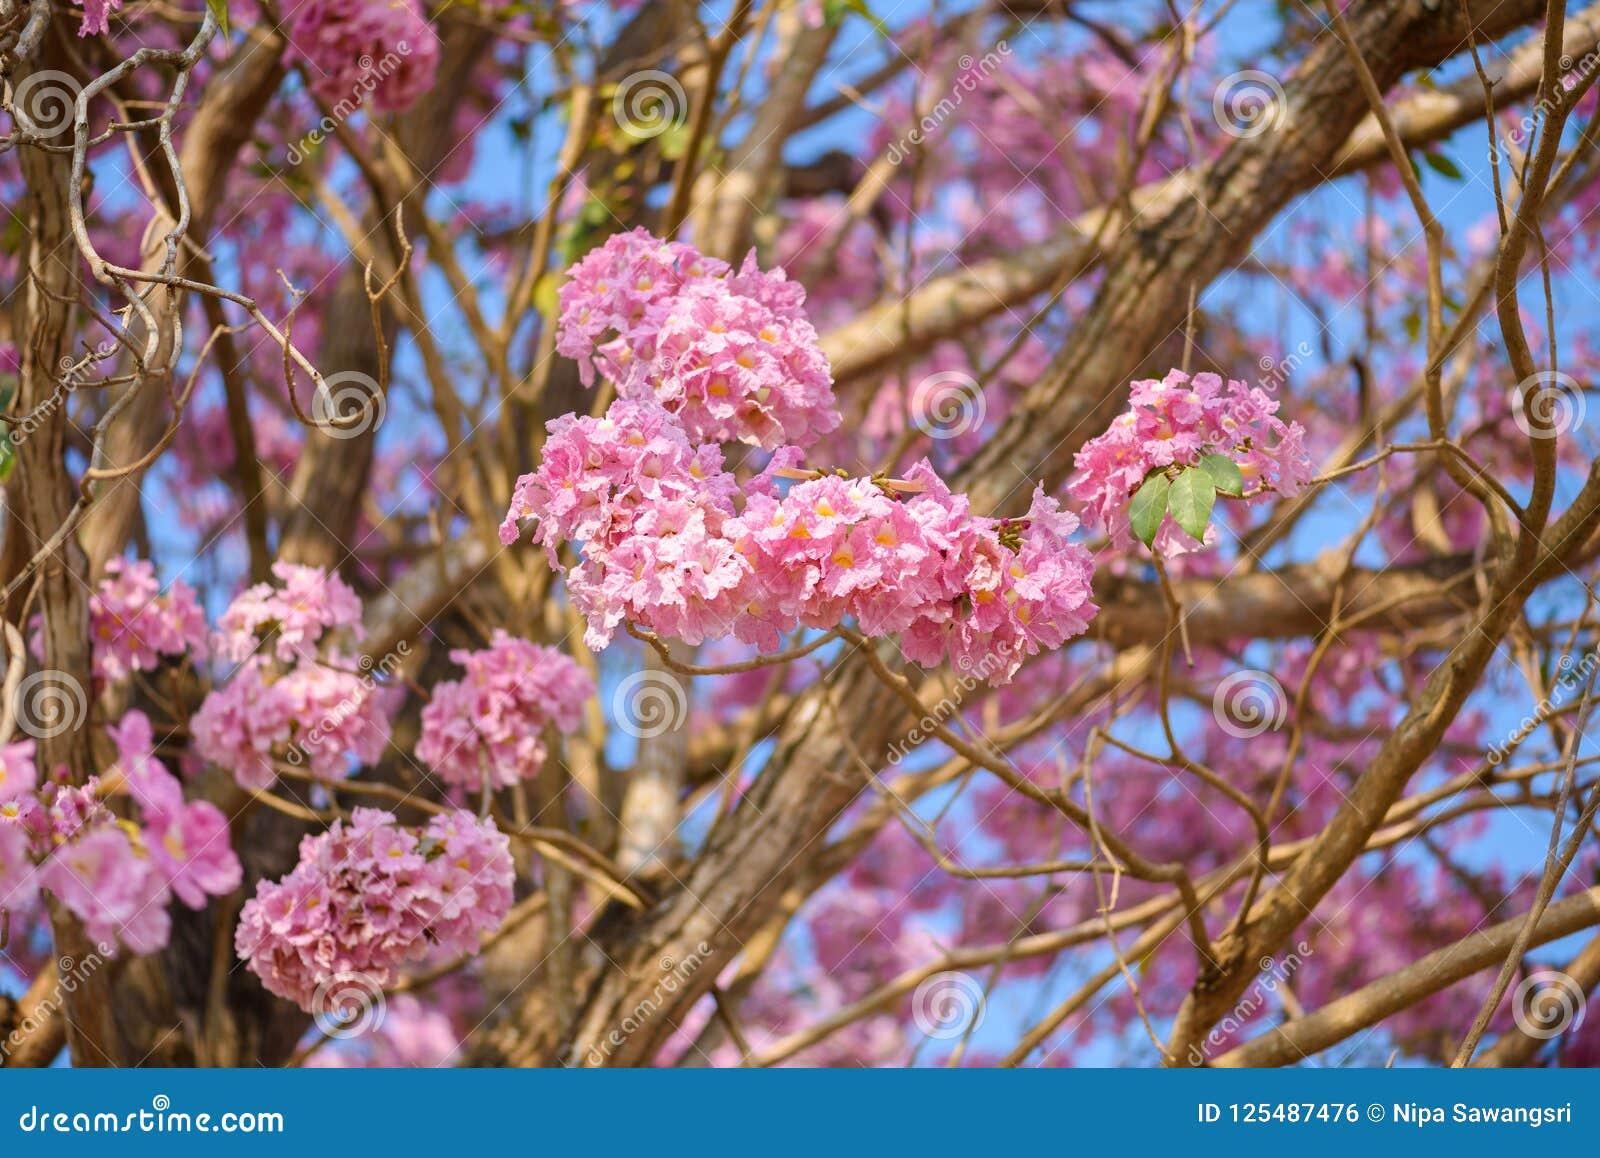 Tabebuia rosea is a pink flower neotropical tree stock photo image tabebuia rosea is a pink flower neotropical tree common name pink trumpet tree pink poui pink tecoma rosy trumpet tree basant rani mightylinksfo